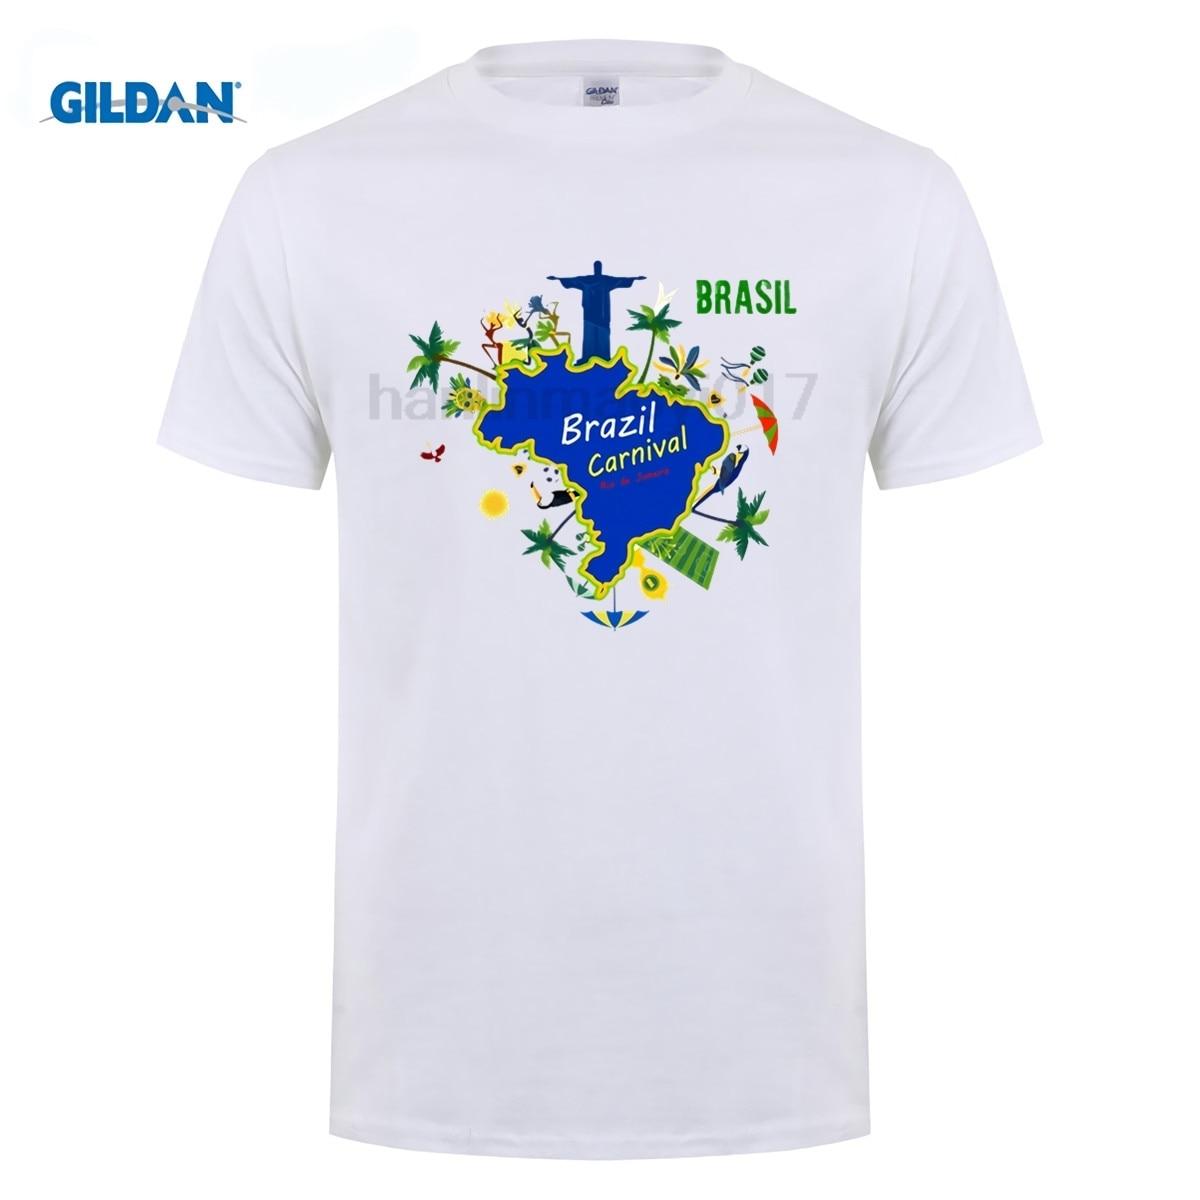 GILDAN Beach Style T-shirts Man  Tree Fashion Round Neck Fitness Tshirts Funny Brazil T shirt Men